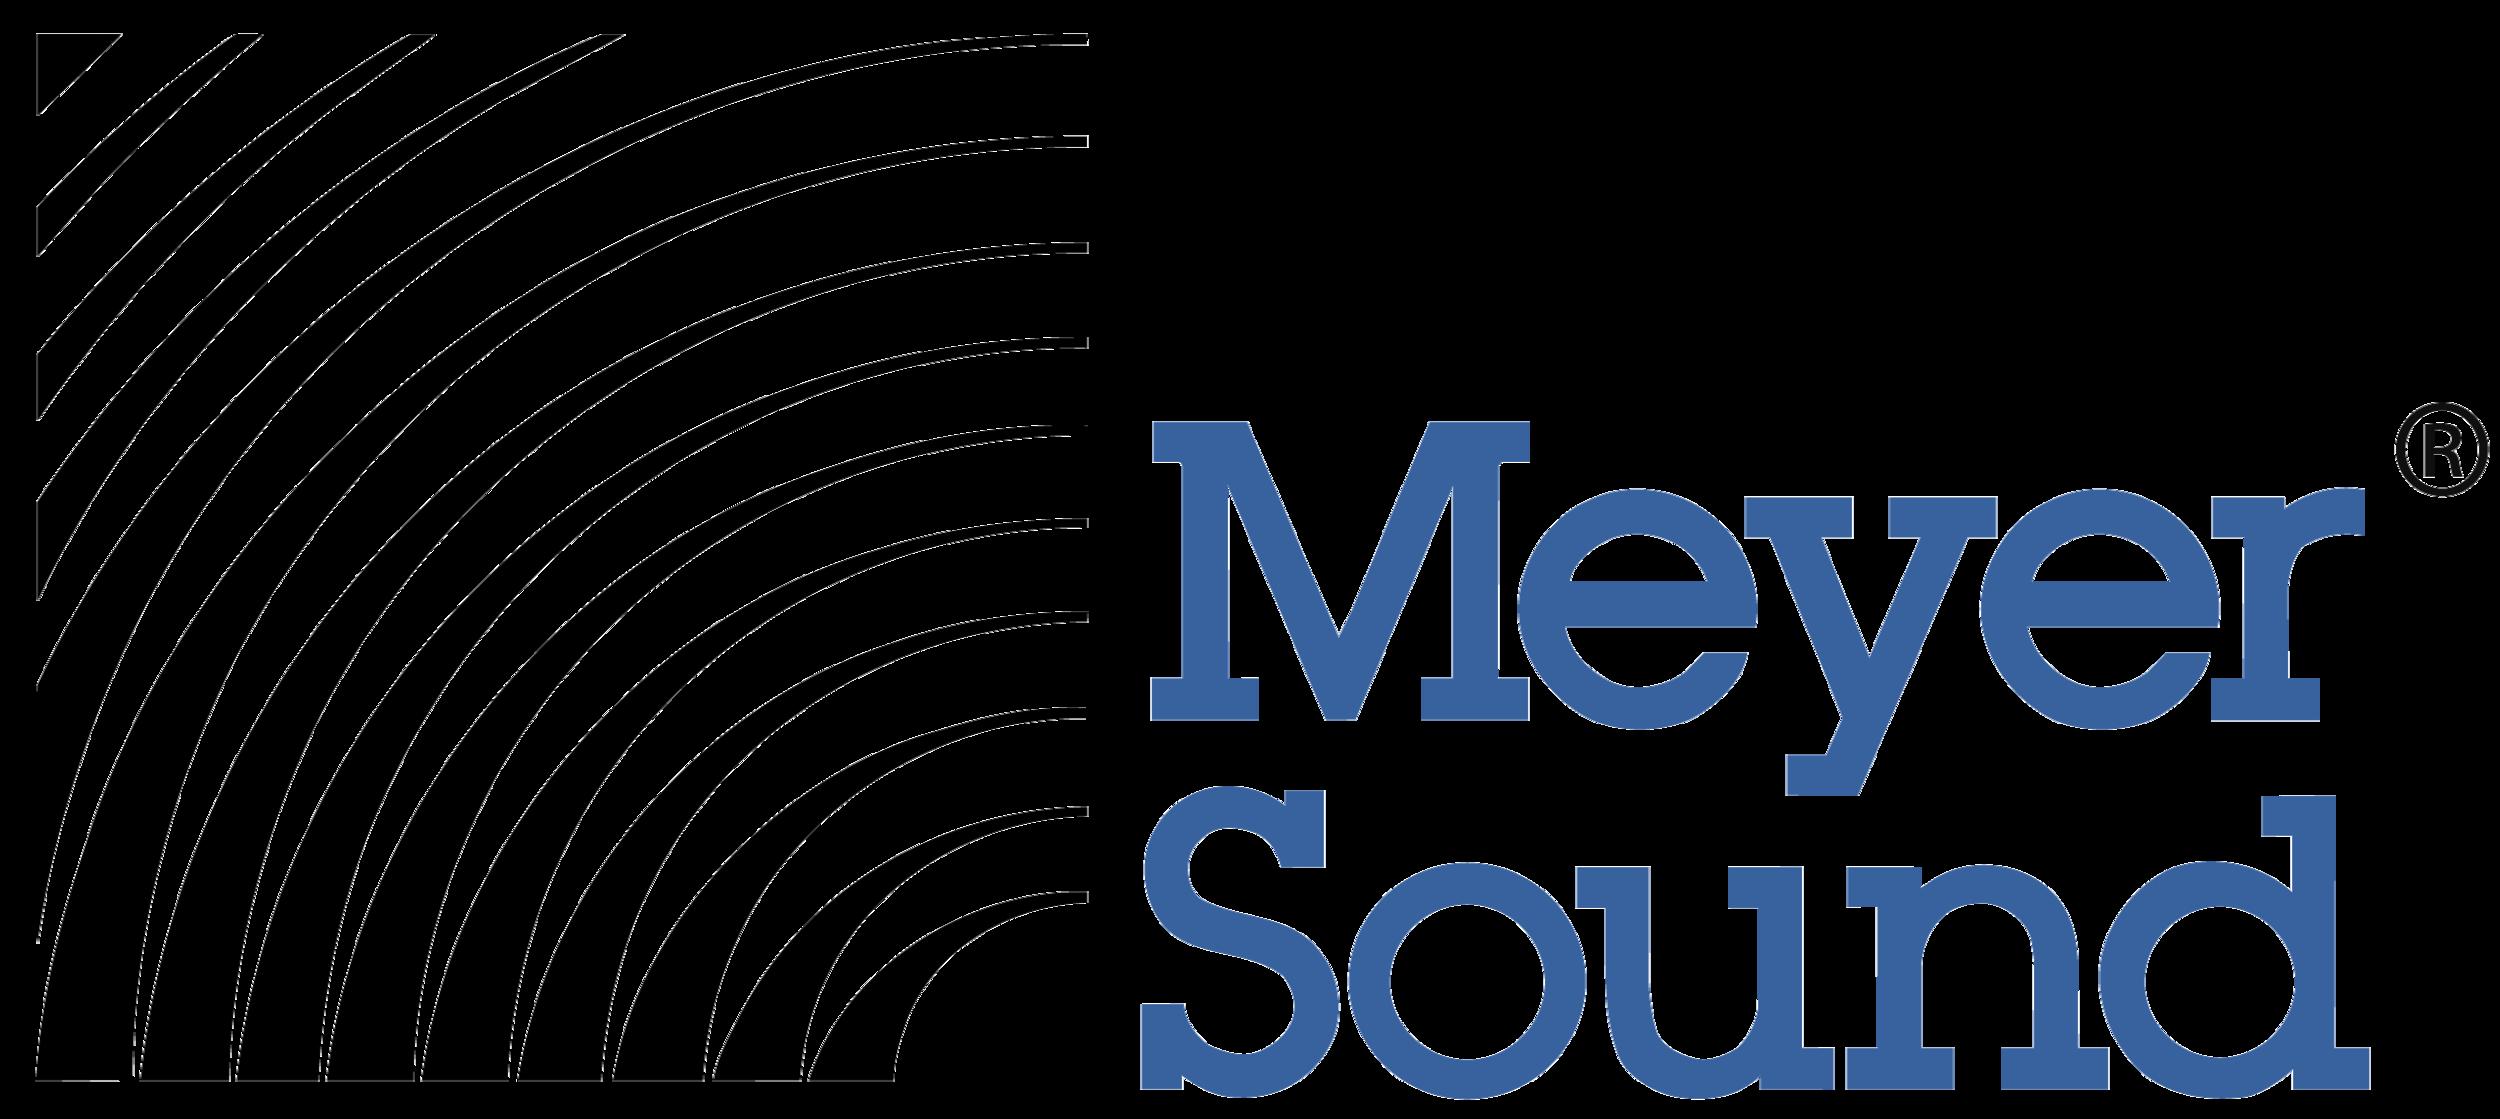 Meyer Sound.png